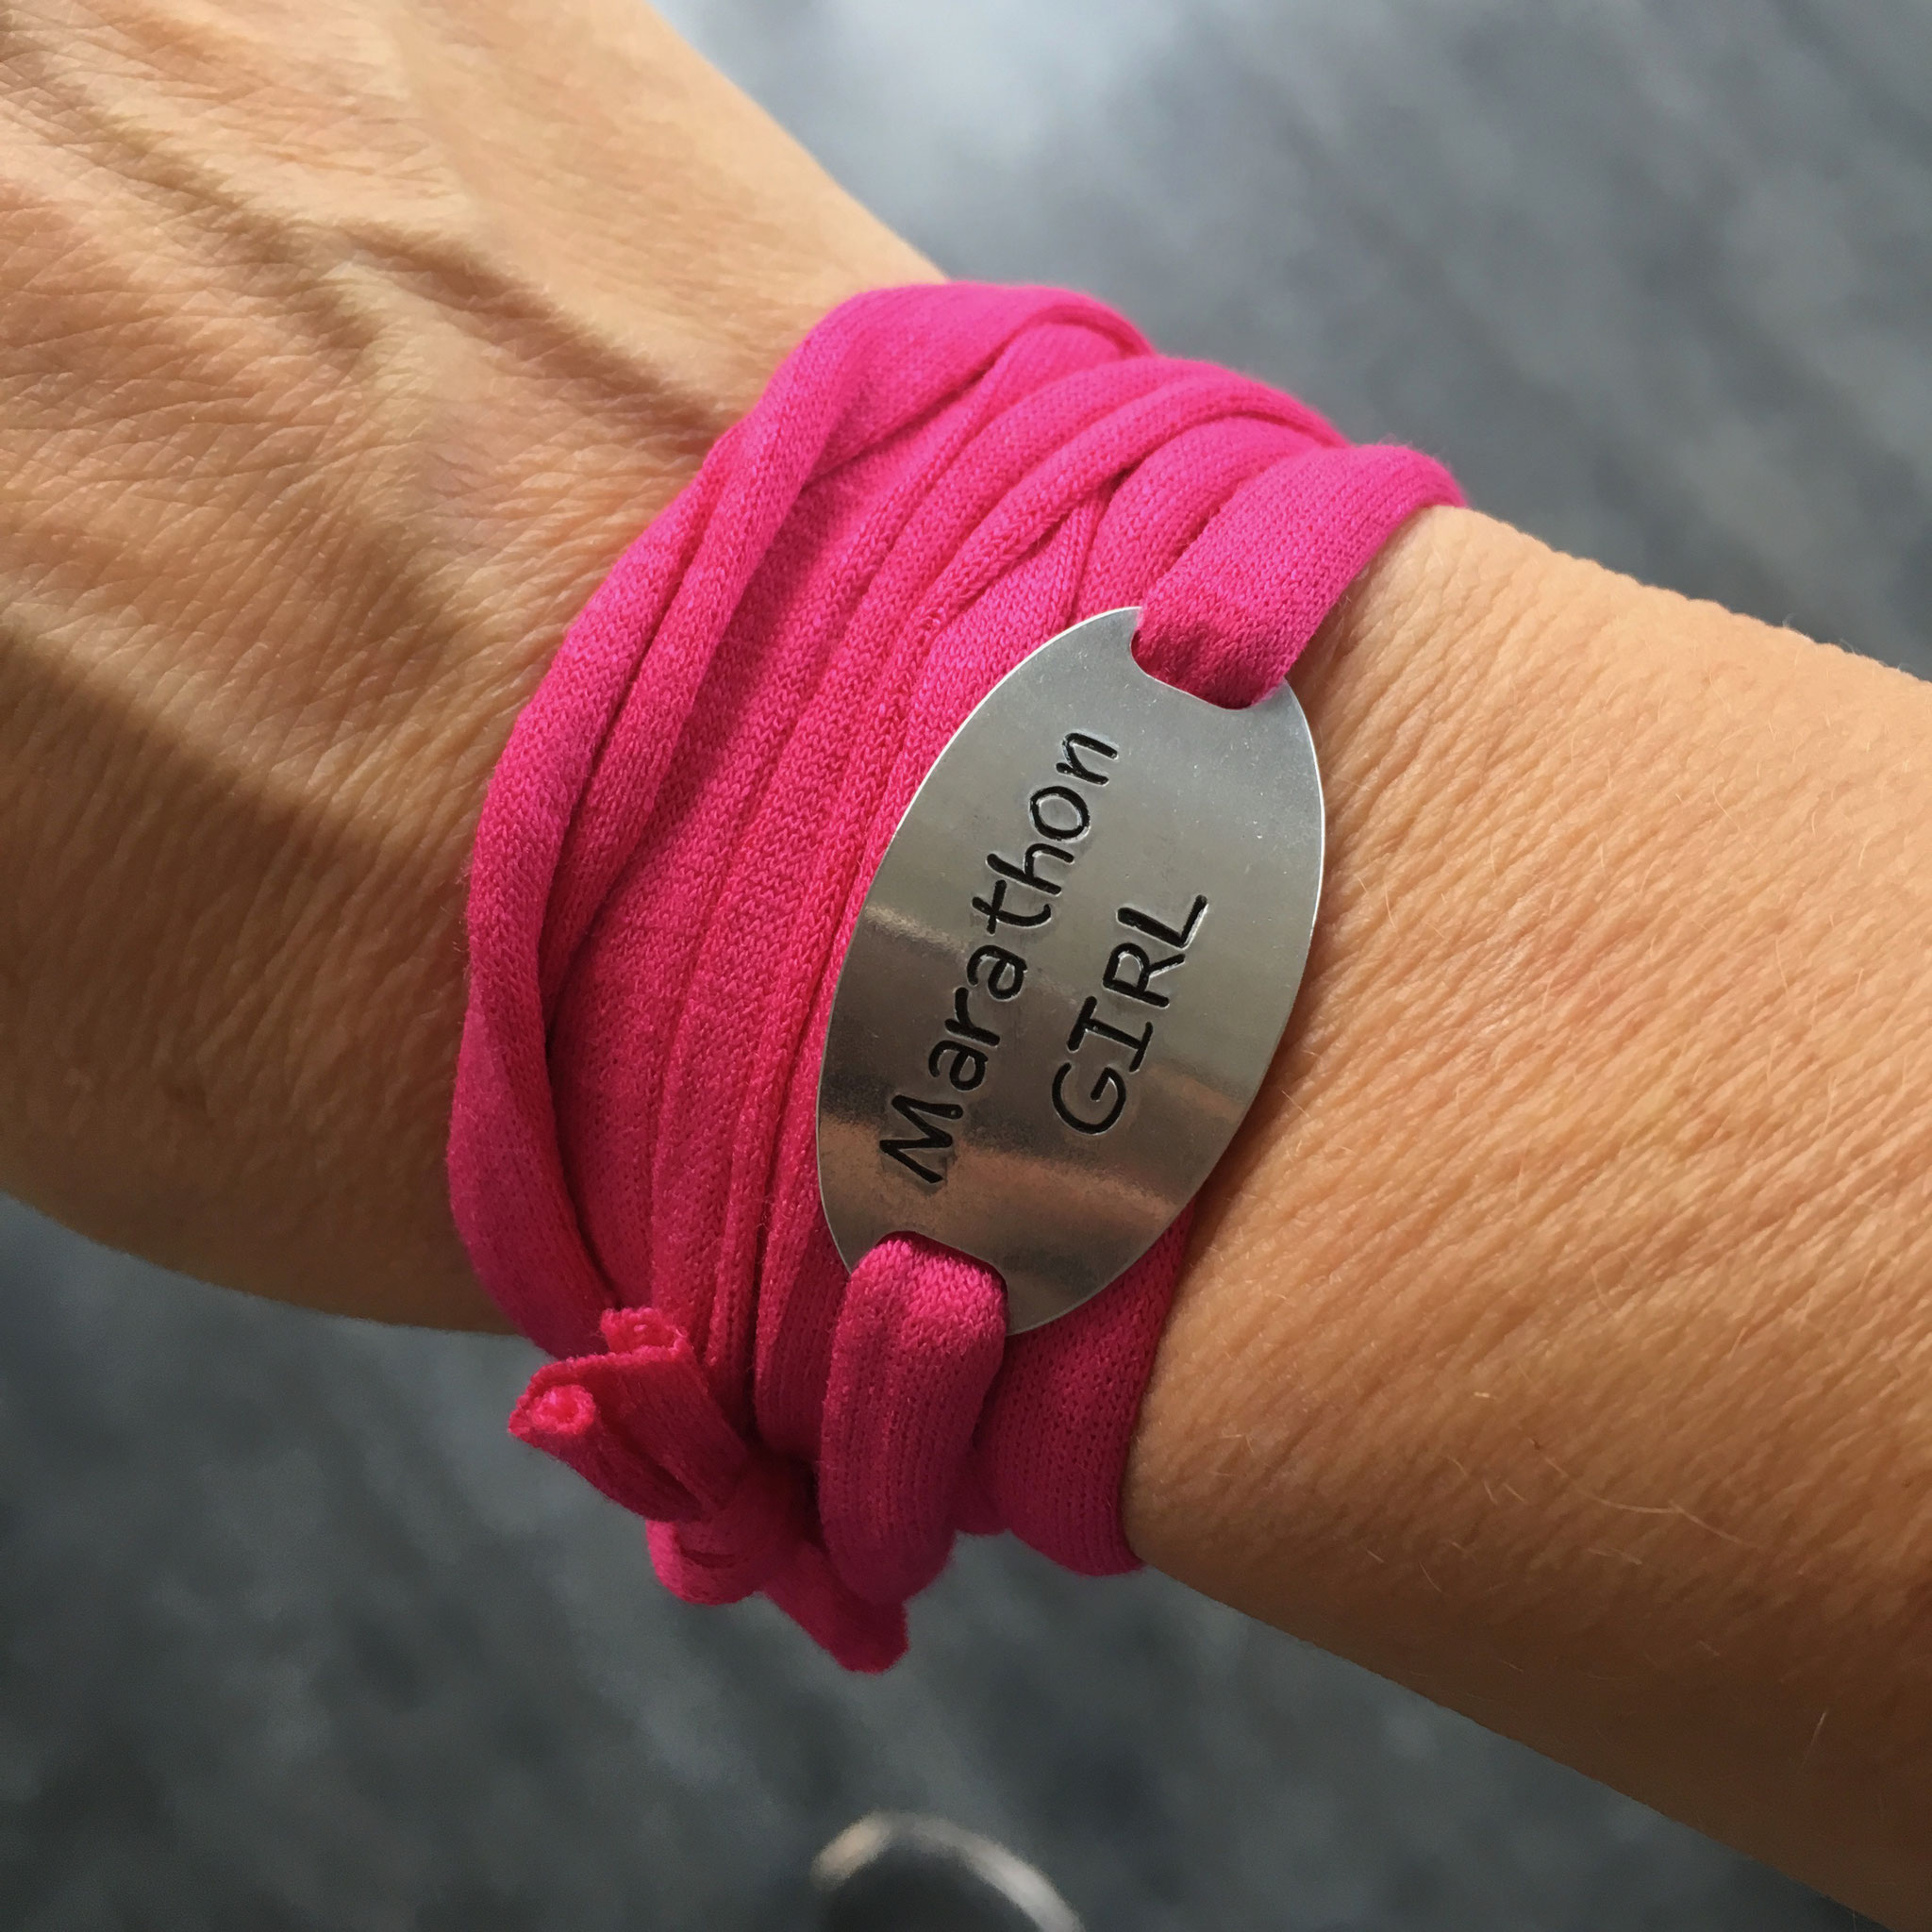 Bracelet bijoux sport plaque métal gravée poinçonnée motivation running marathon fait main made in France girl run